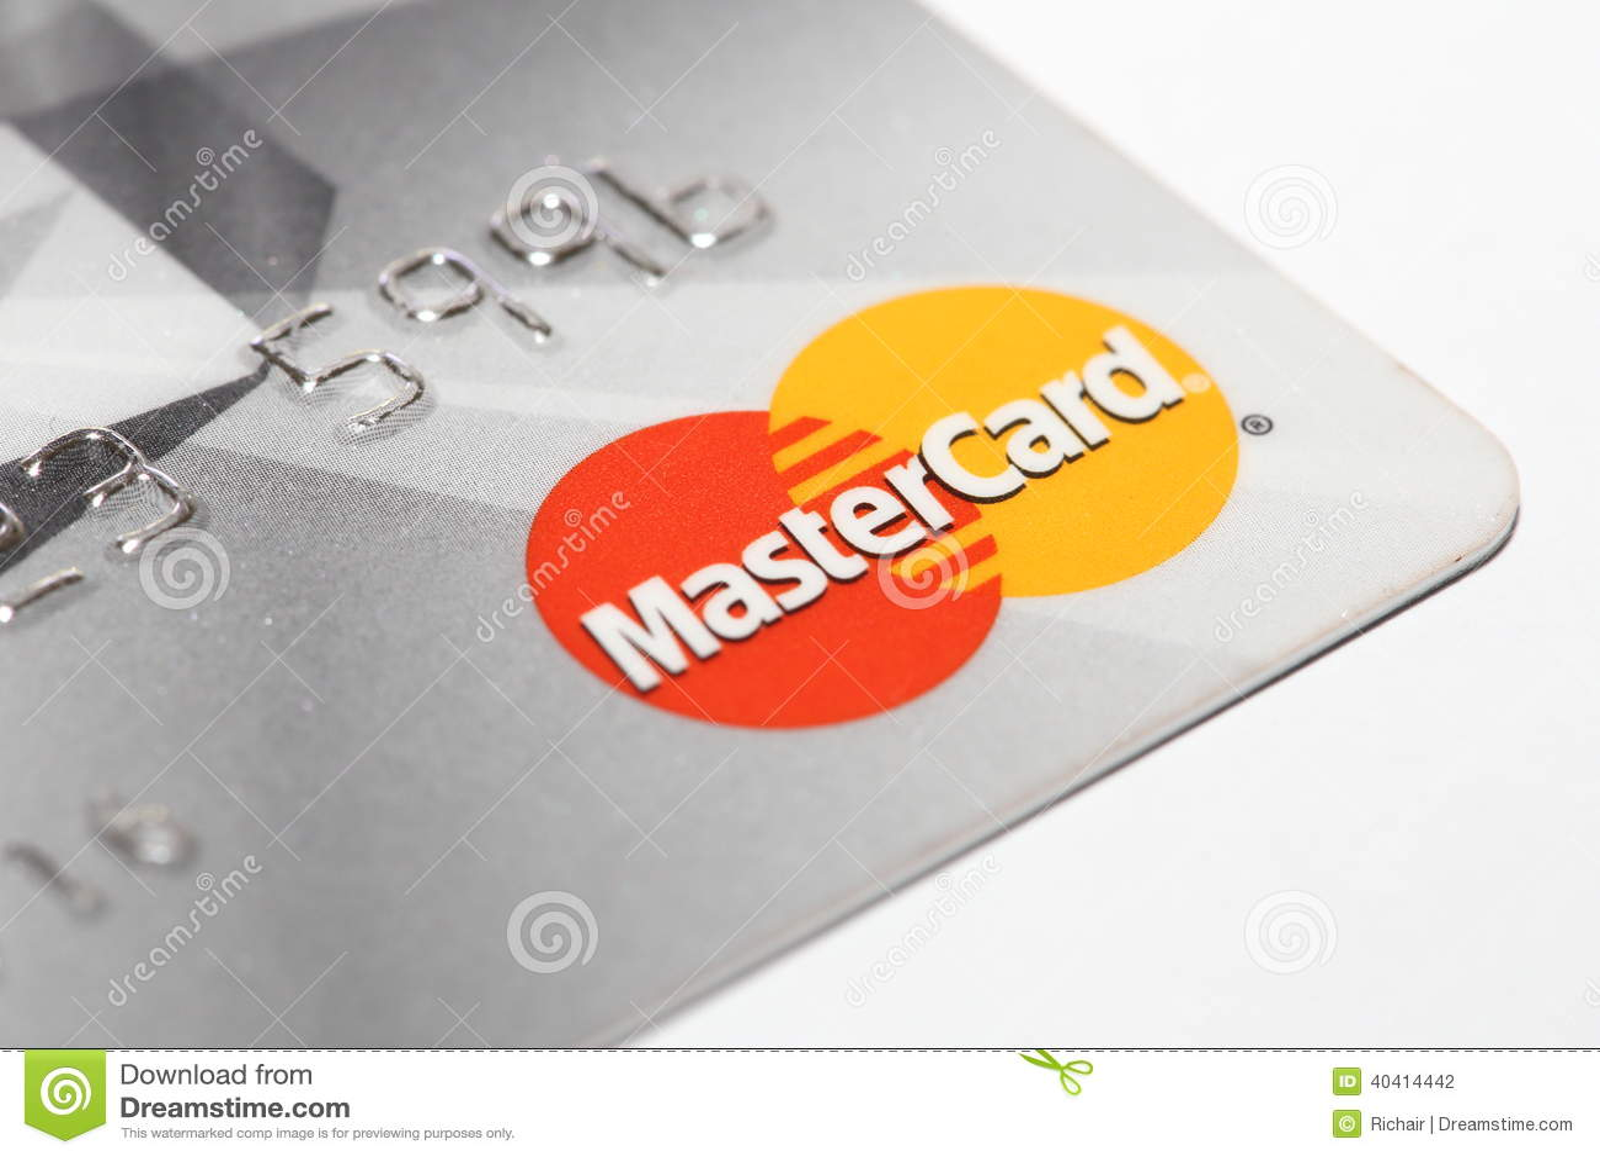 mastercard logo on credit card editorial photography